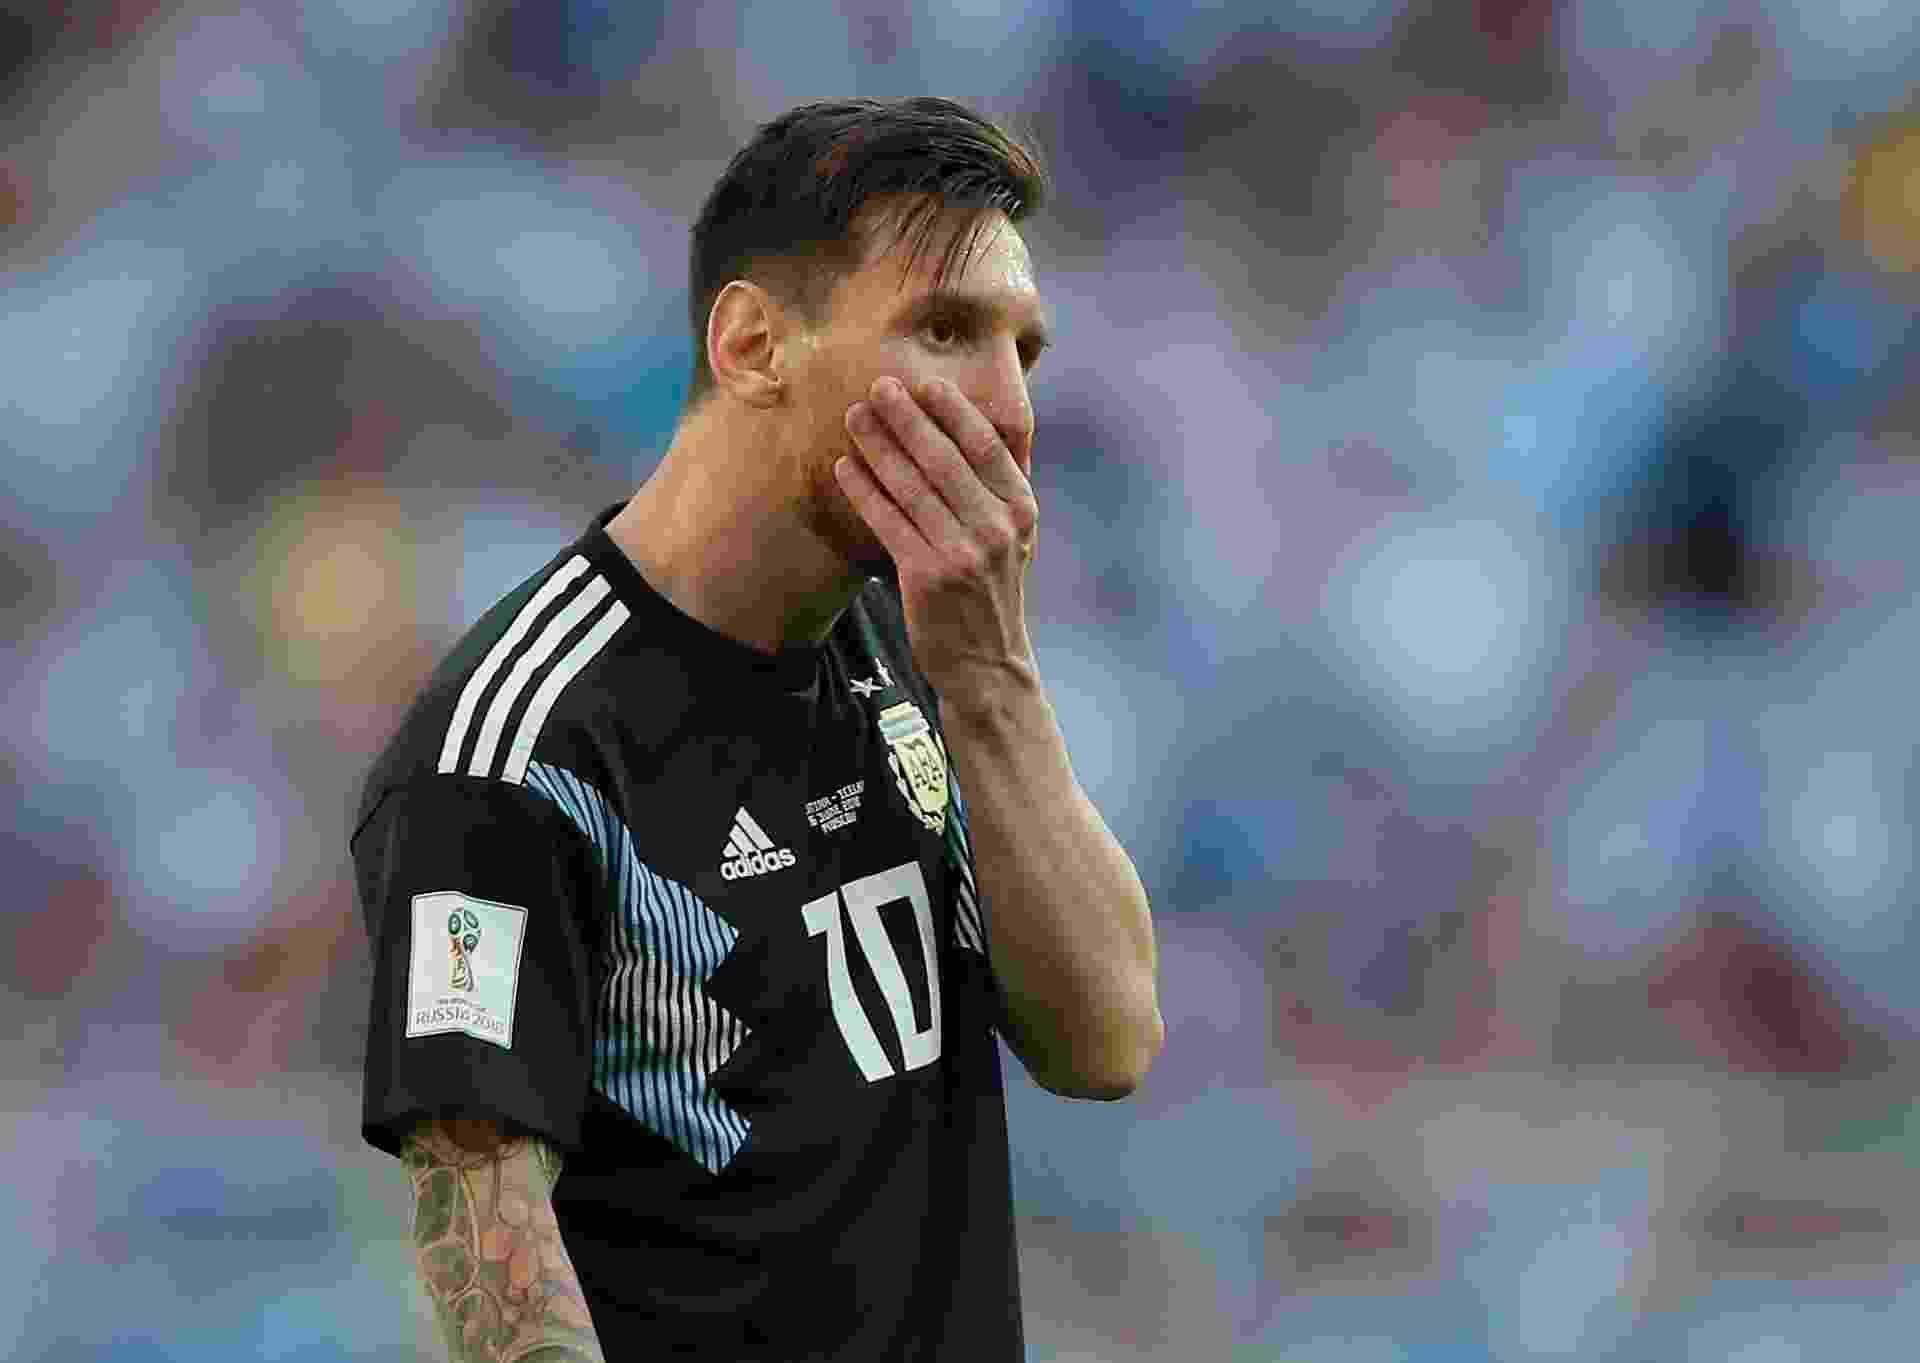 Lionel Messi perde pênalti no duelo contra a Islândia e fica desacreditado - REUTERS/Maxim Shemetov